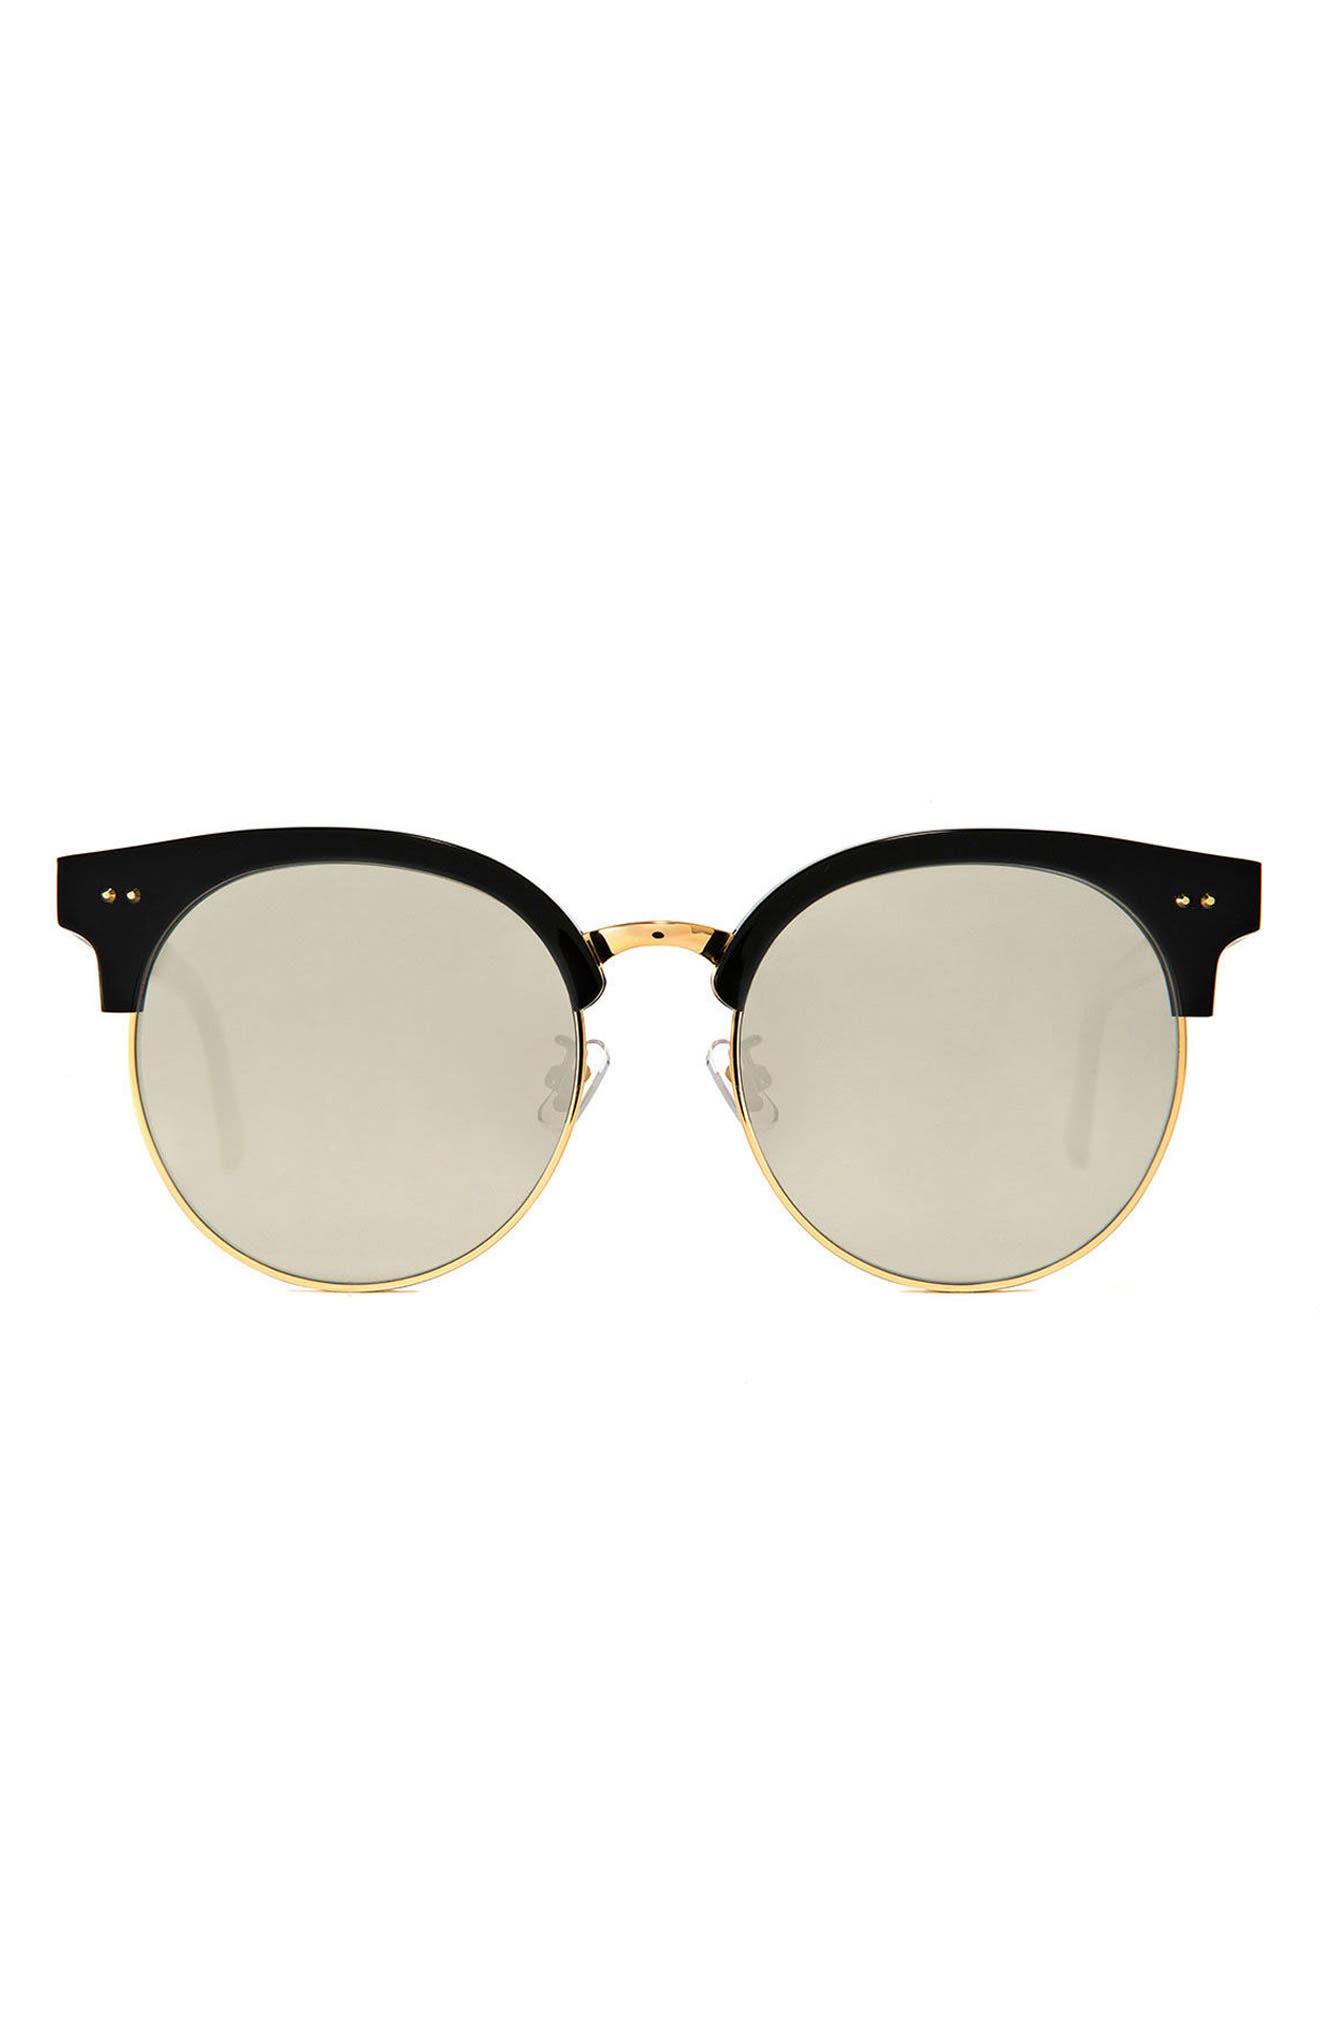 Moon Cut 55mm Sunglasses,                         Main,                         color, Black/Gold